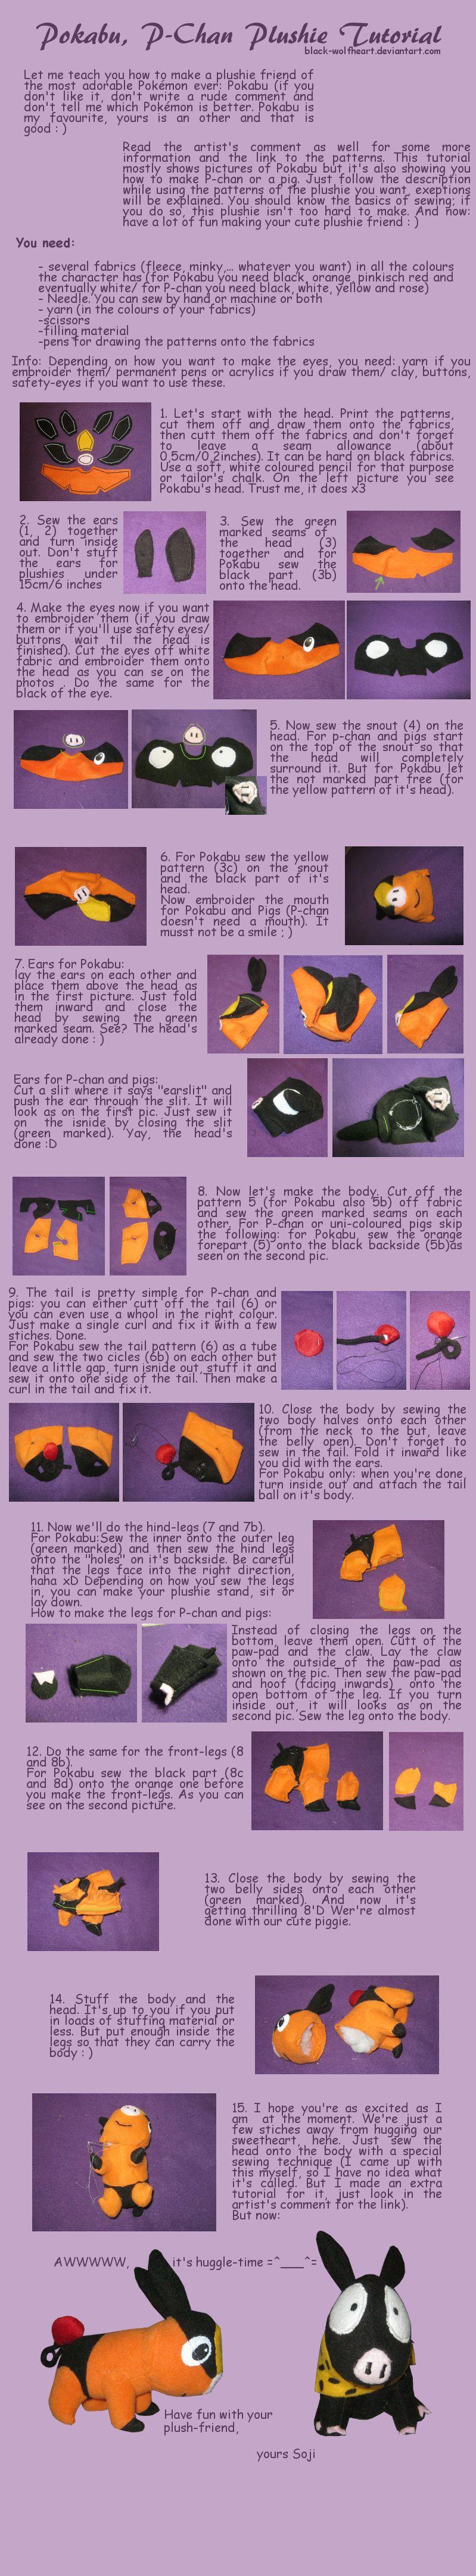 Tepig P Chan Pig Plushie Tutorial By Black Wolfheart On Deviantart Patterns Linked On Page Pig Plushie Plushies Kawaii Crafts [ 4328 x 799 Pixel ]